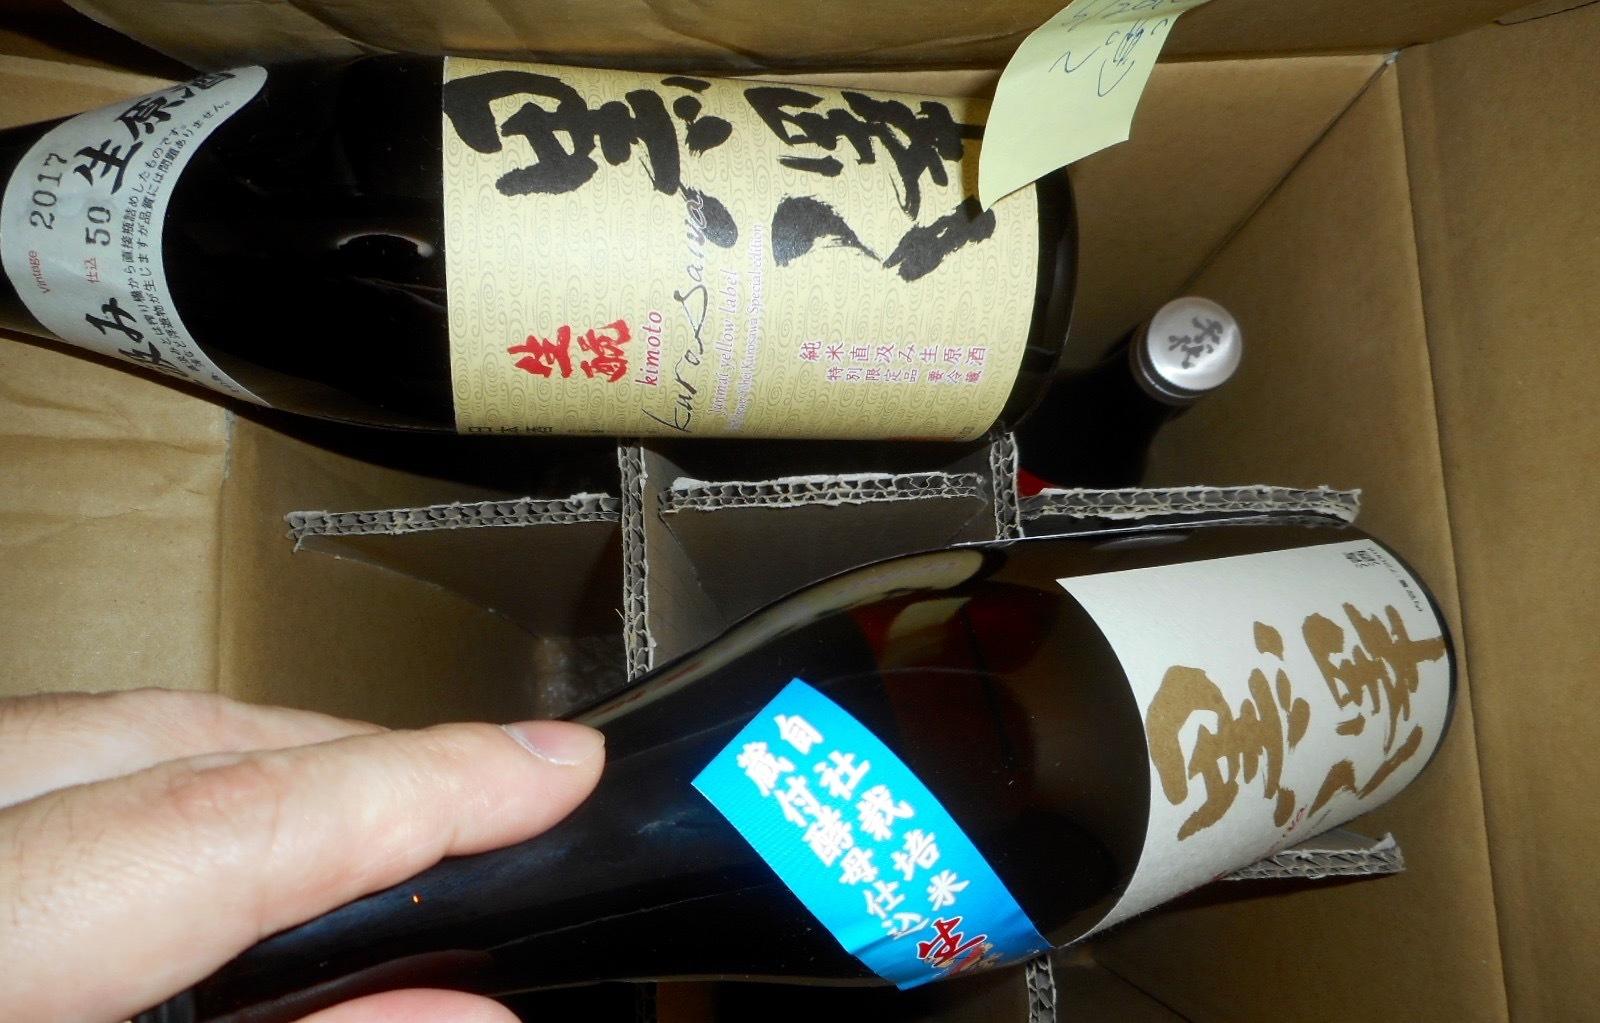 kurosawa_hozumi29by12.jpg